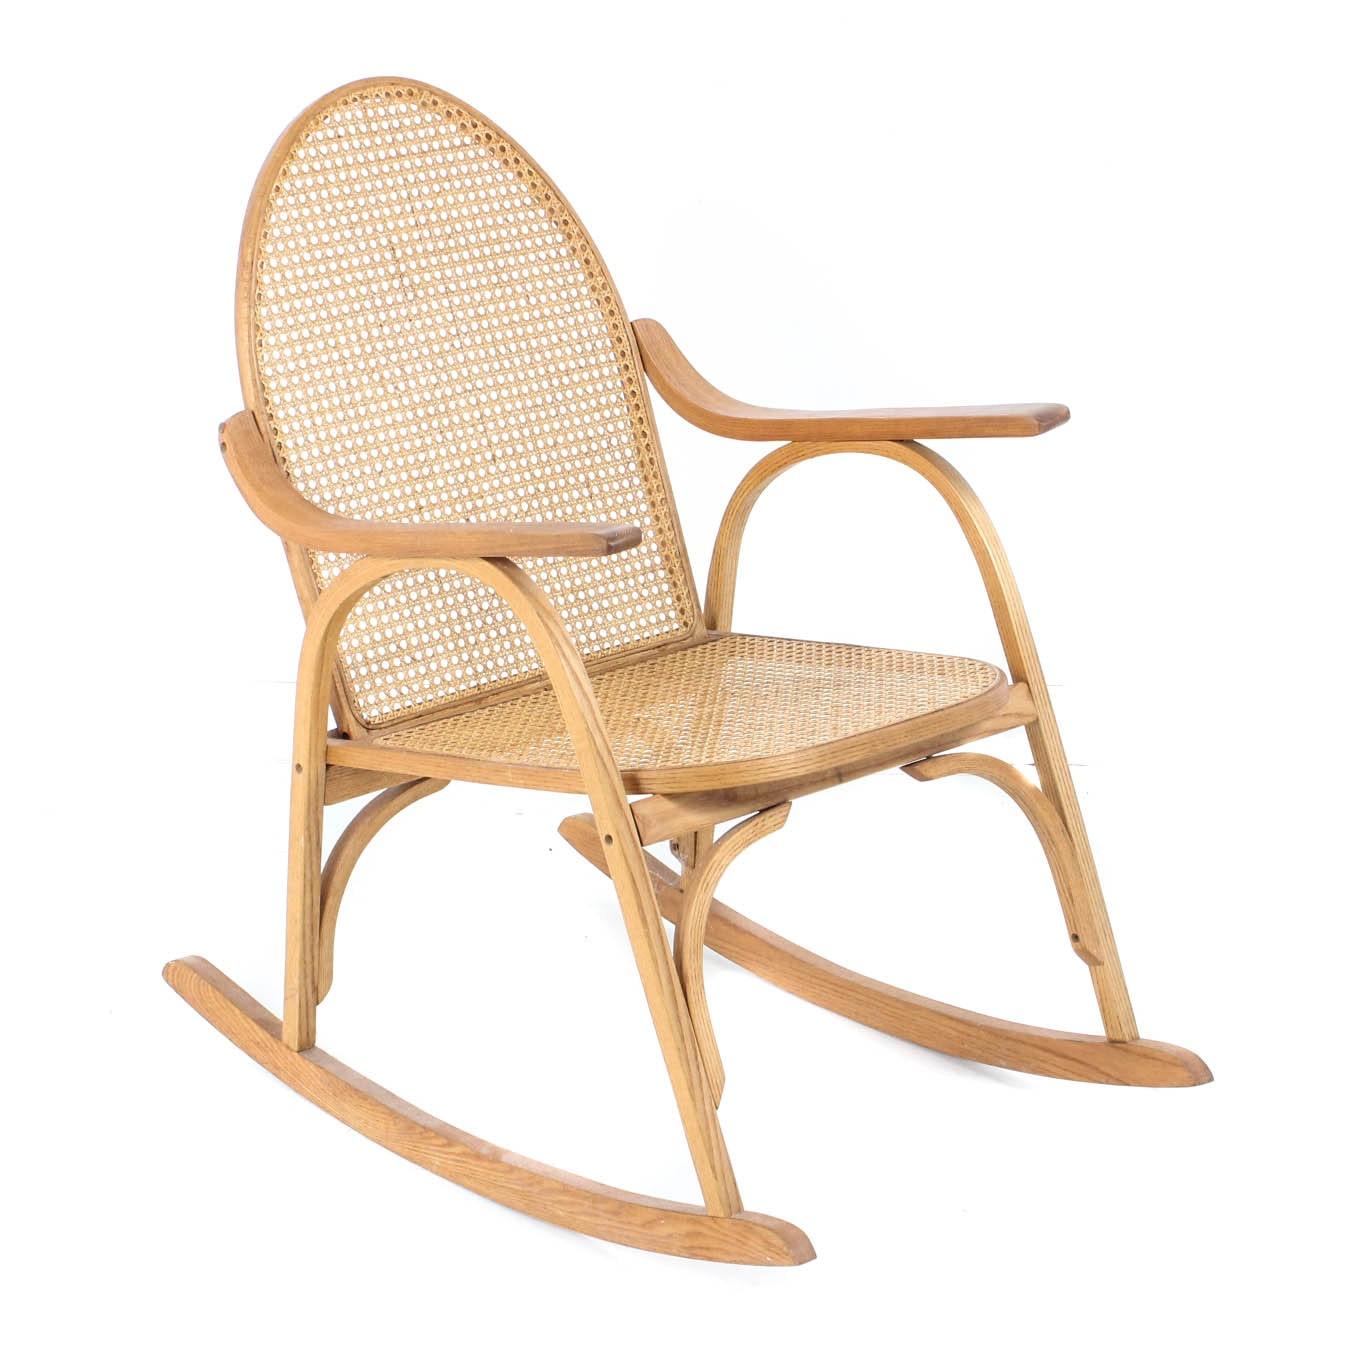 Vermont Tubbs Cane Rocking Chair ...